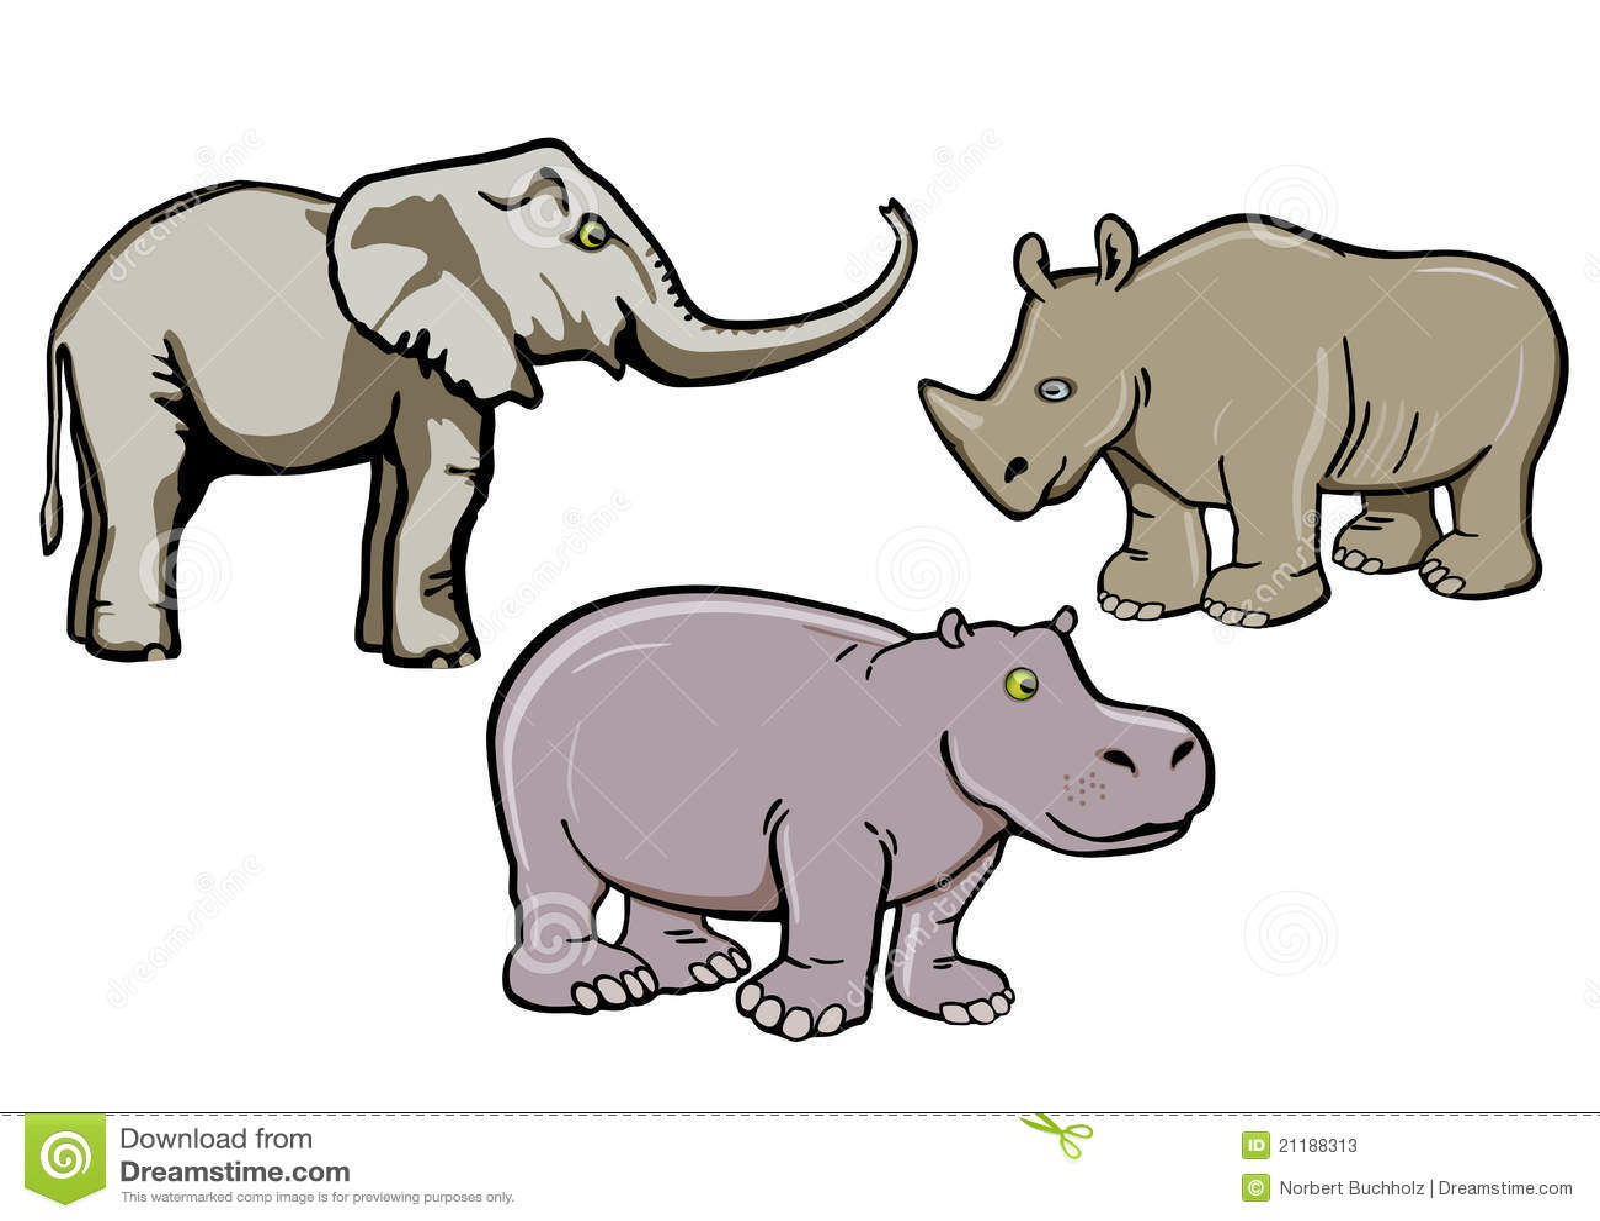 Elephant, rhino and hippo